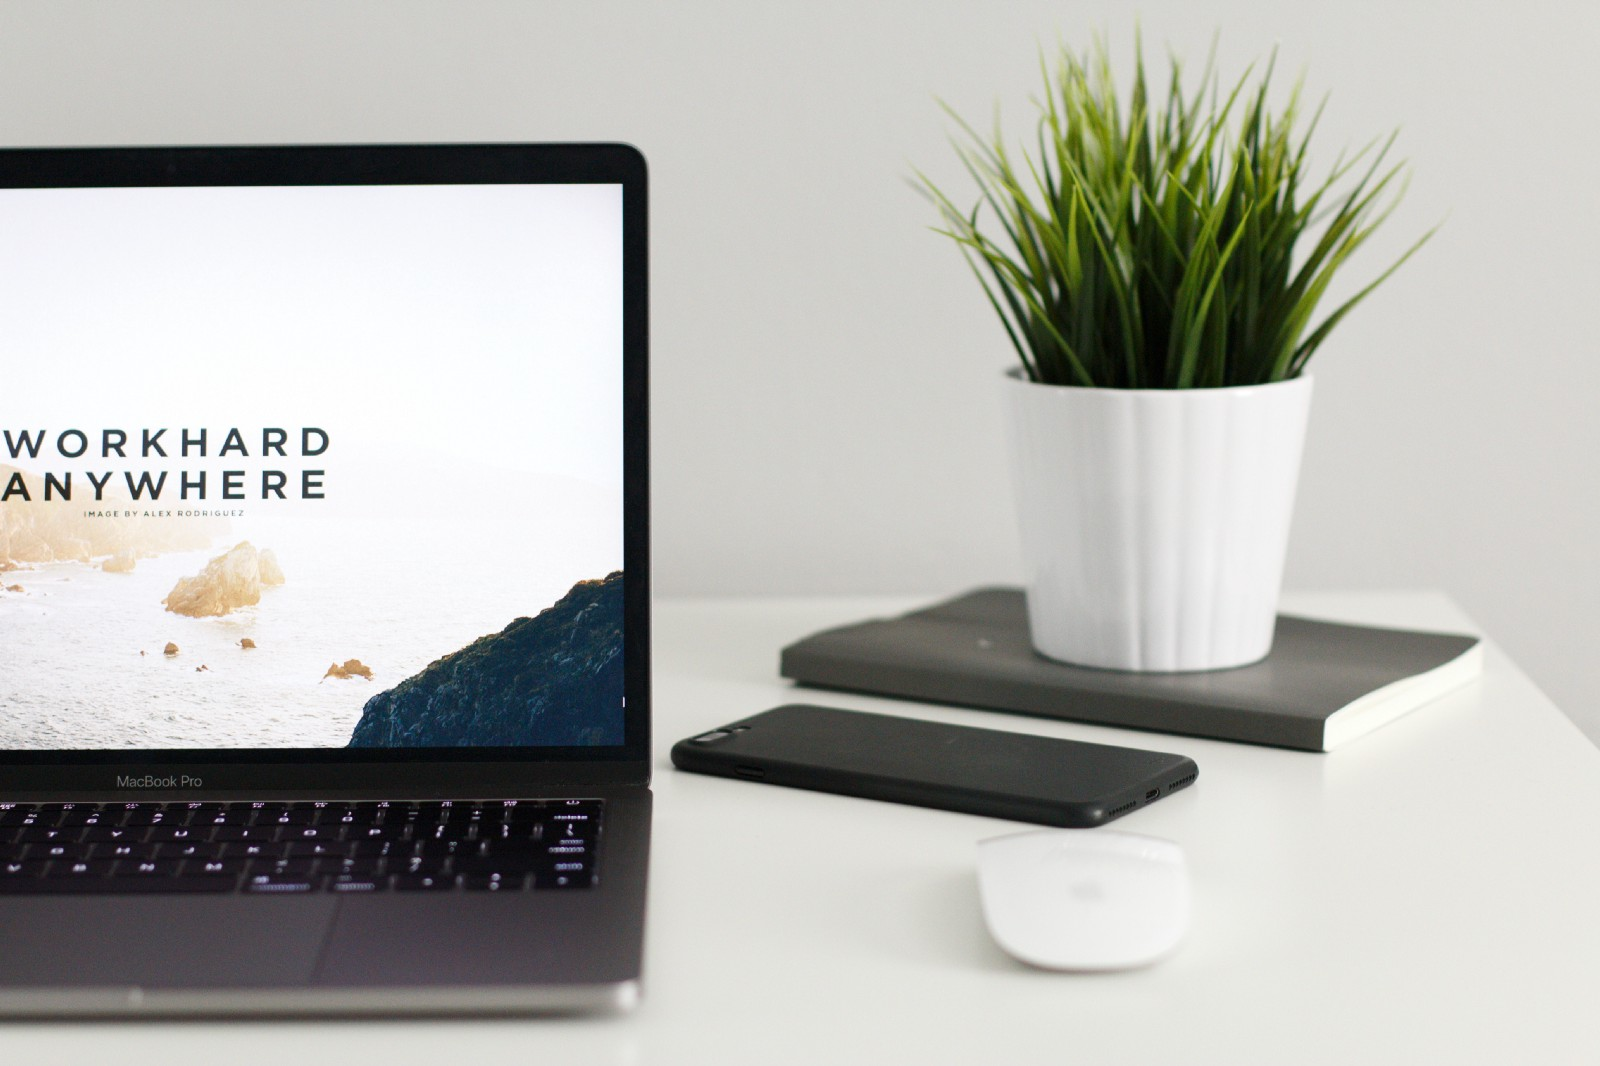 Travailler en freelance de n'importe où